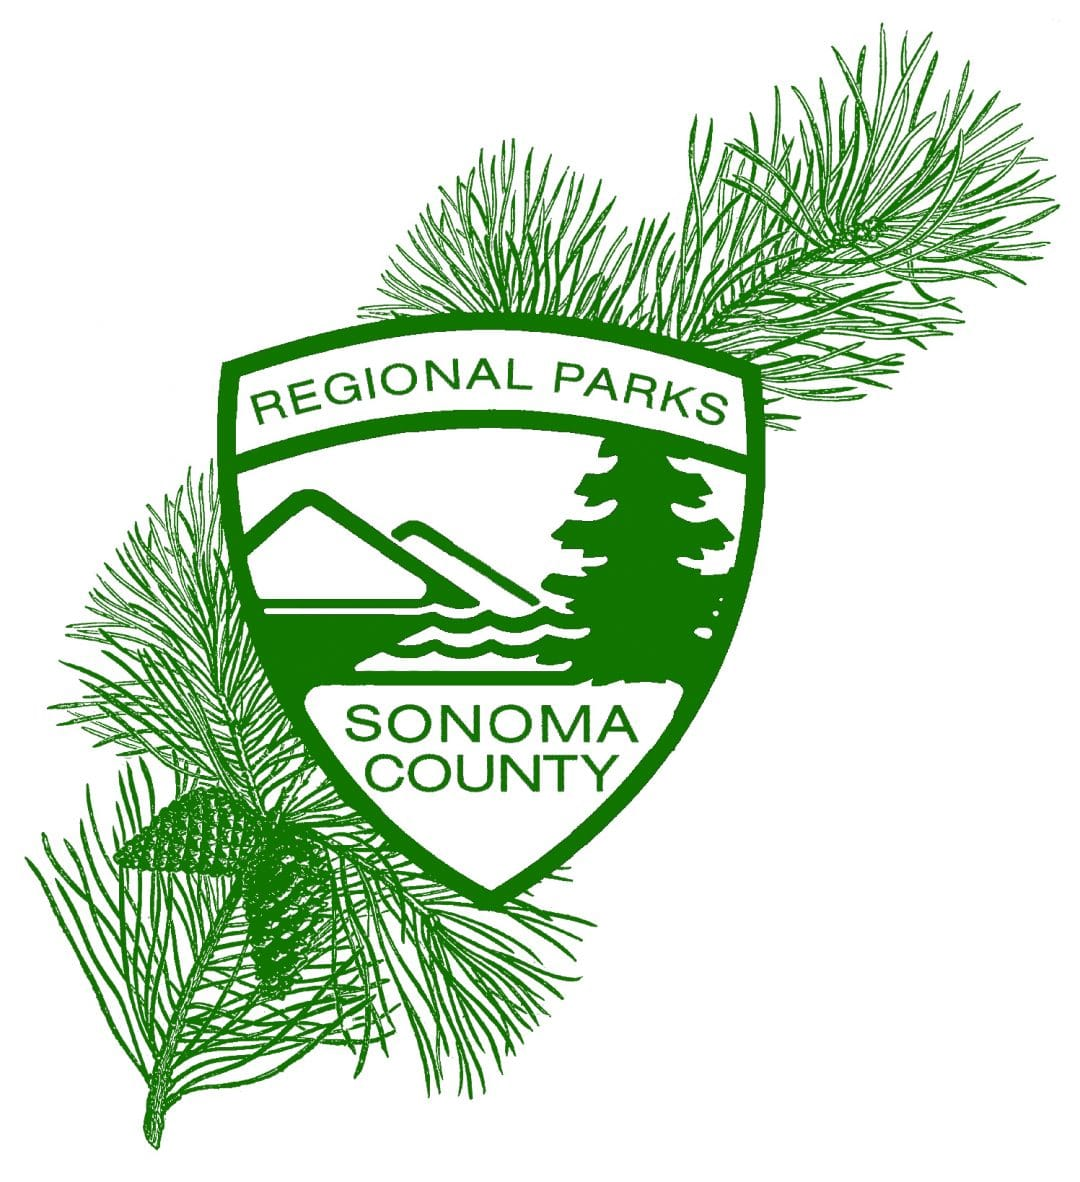 Regional Parks